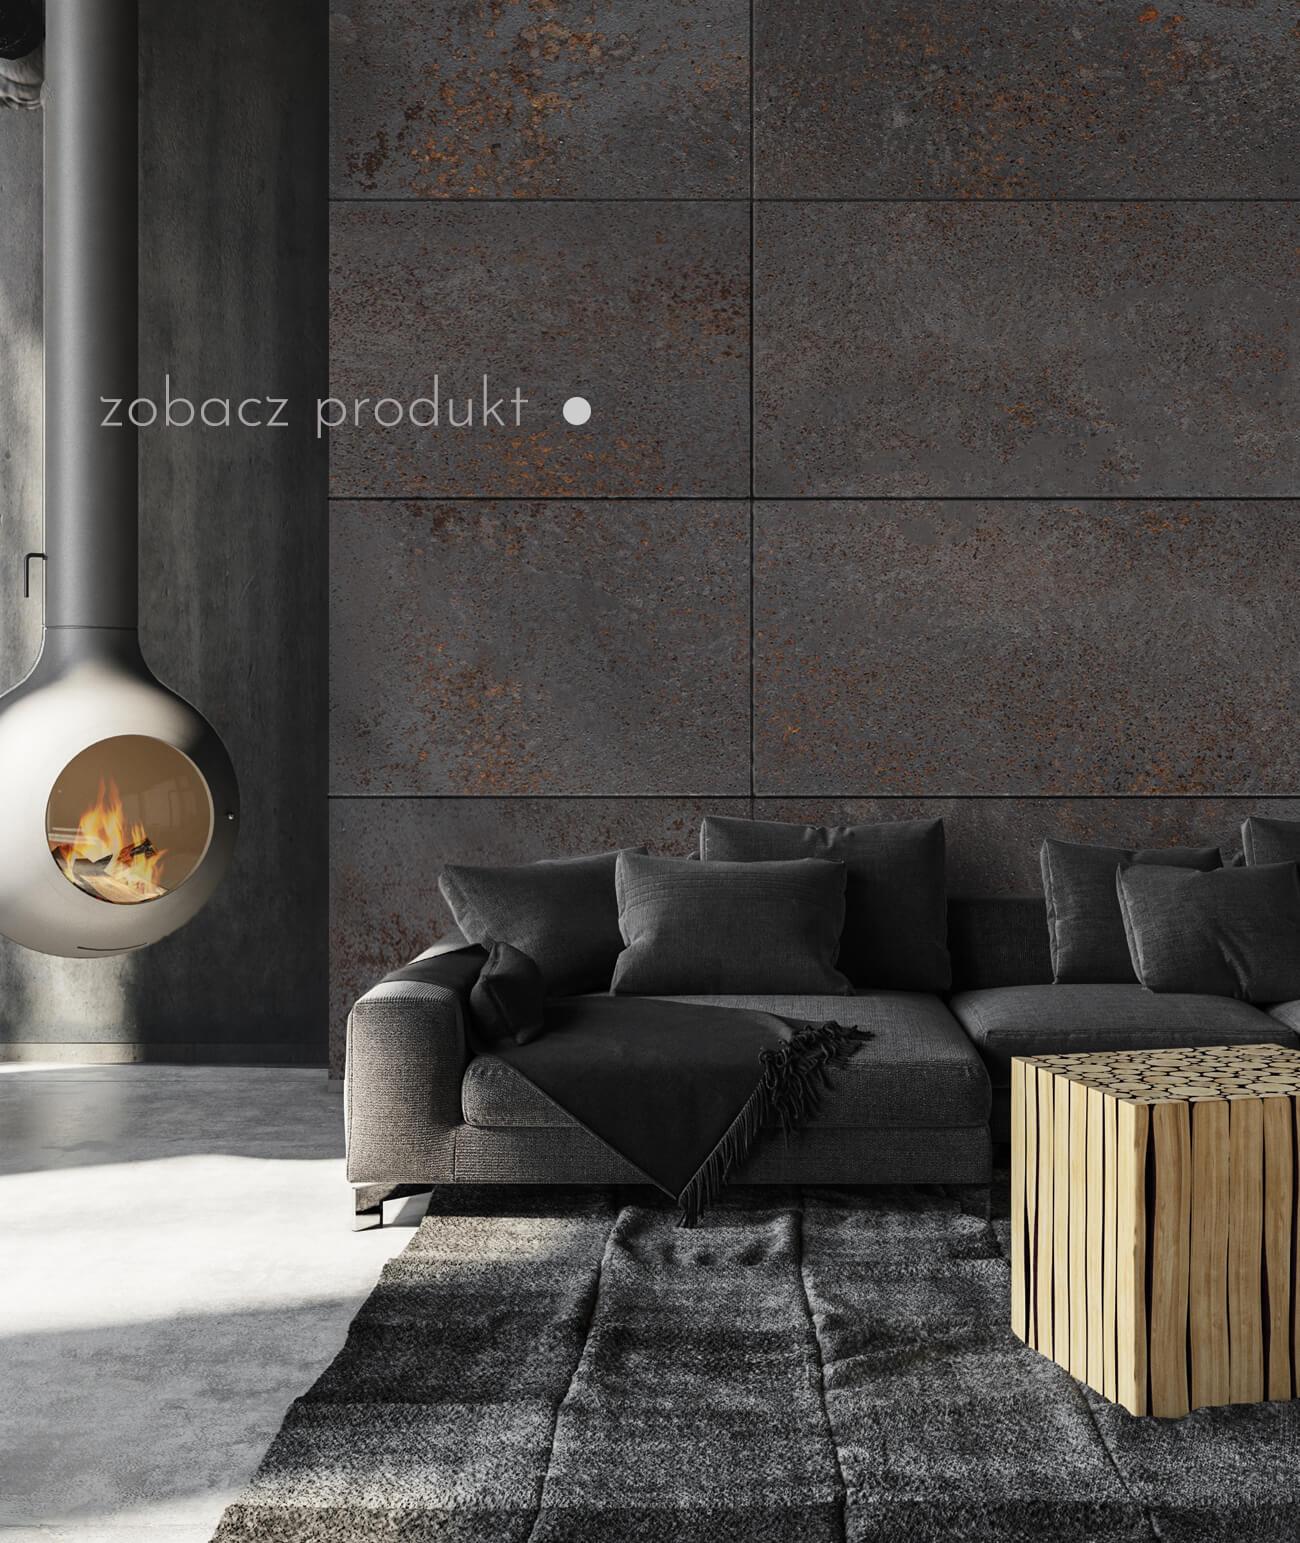 plyty-betonowe-scienne-i-elewacyjne-beton-architektoniczny_1125-24196-ds-antracyt-corten---plyta-beton-architektoniczny-grc-ultralekka-ultralekka